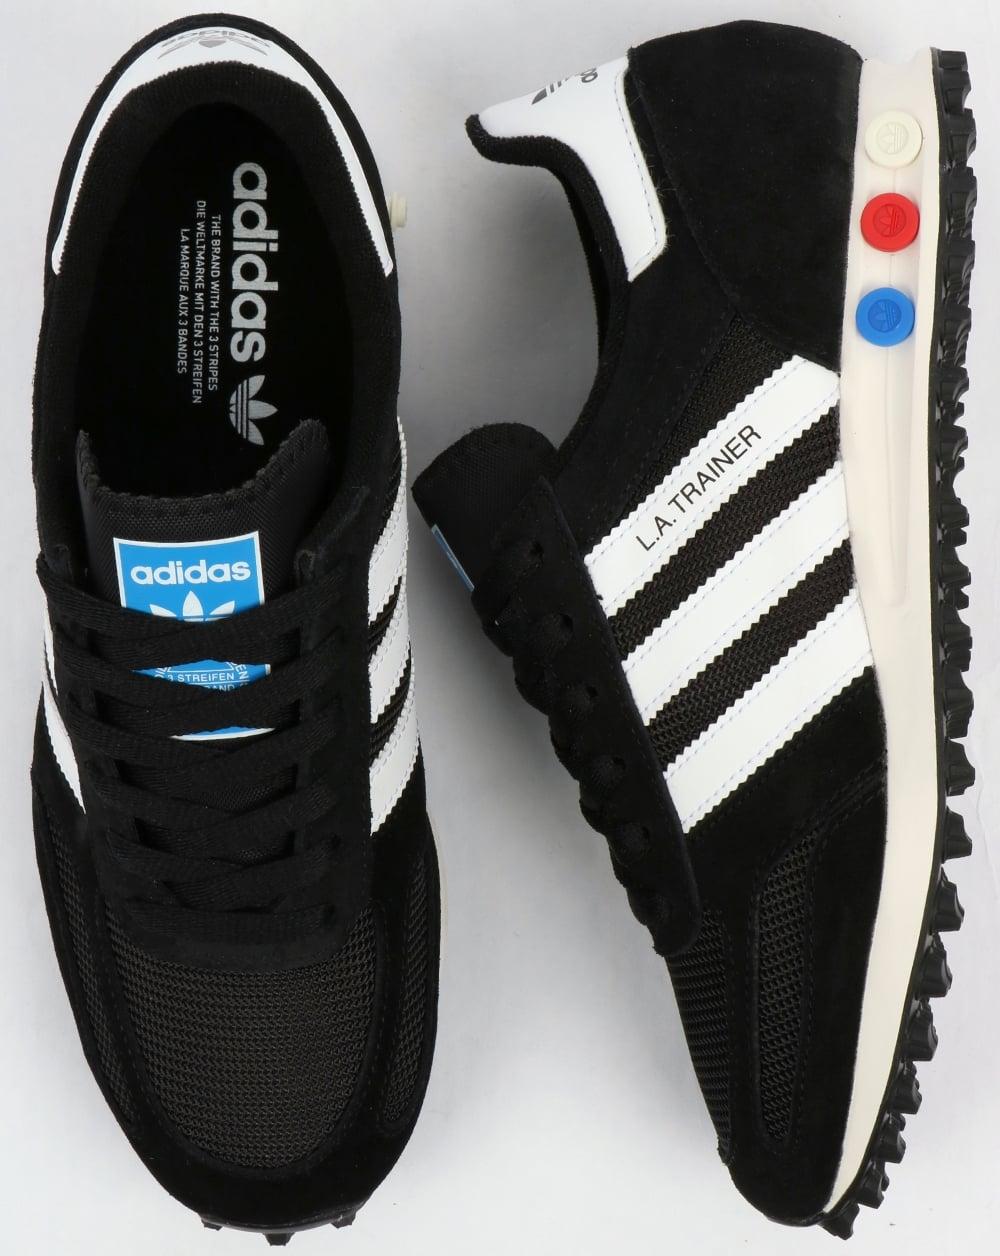 buy popular d7959 8d099 adidas Trainers Adidas LA Trainer OG Black White